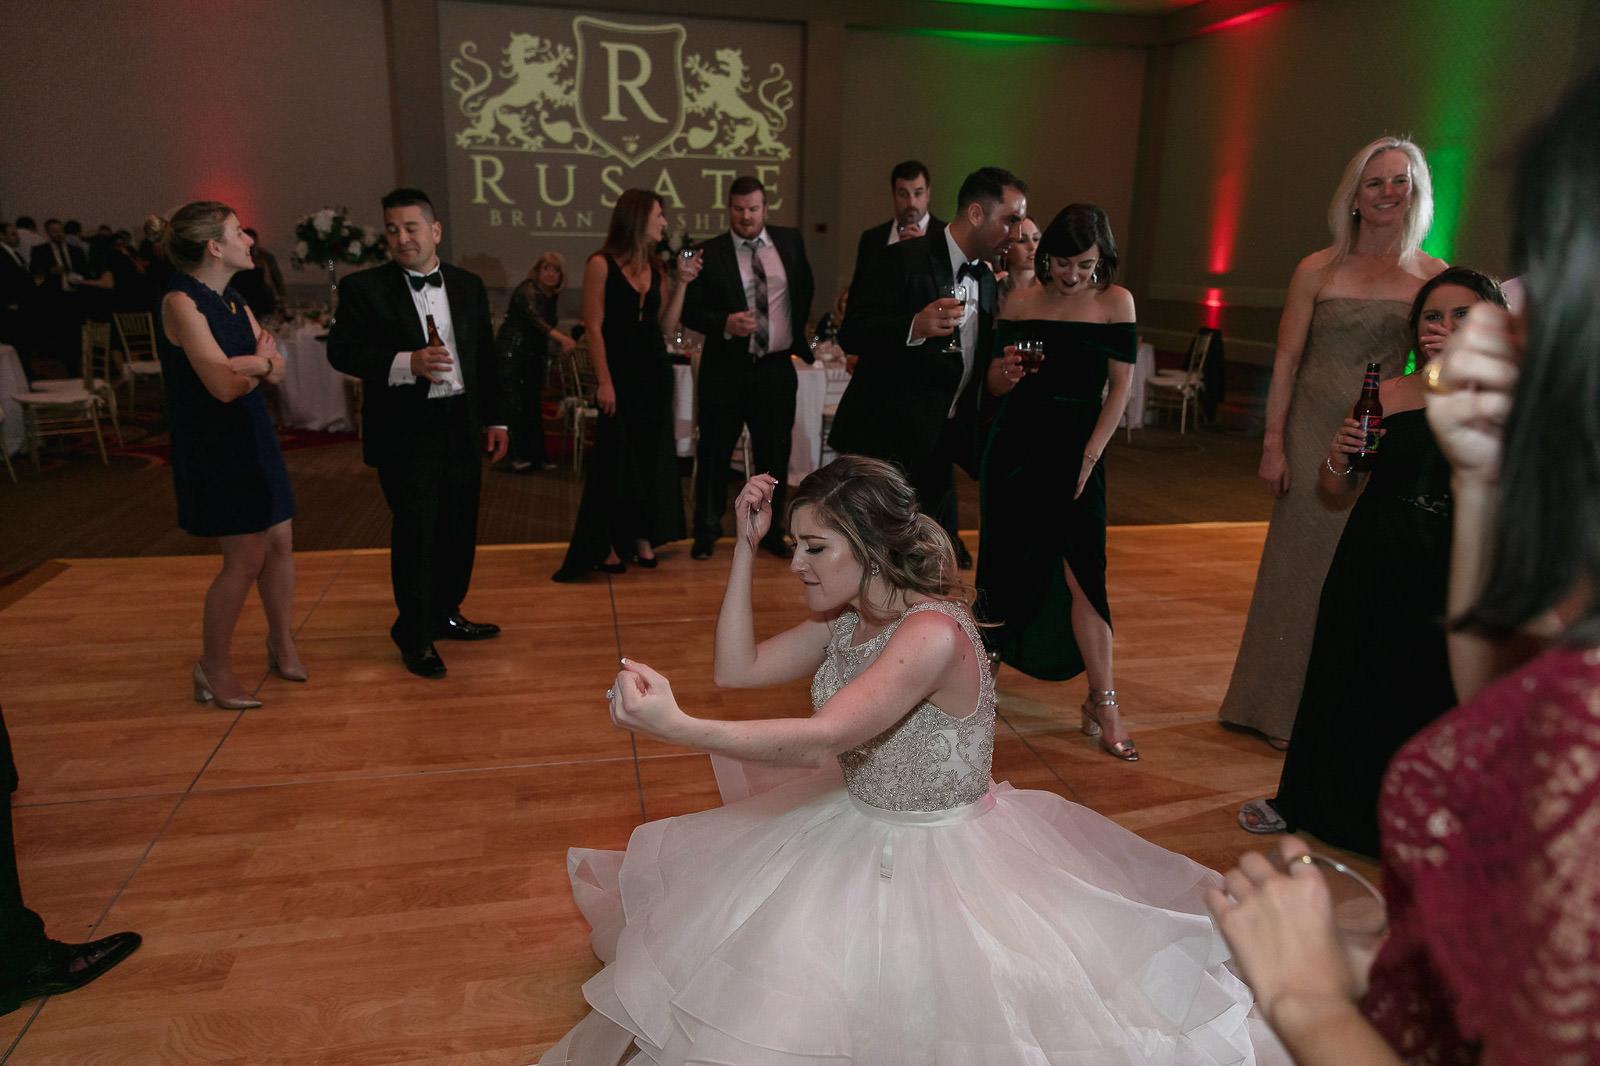 Omni Hotel Providence, Omni, Providence, Rhode Island, RI, Wedding, city wedding, November wedding, Tracy Jenkins Photography, RI wedding photographer, Rhode Island Wedding photographer, reception, bride dancing